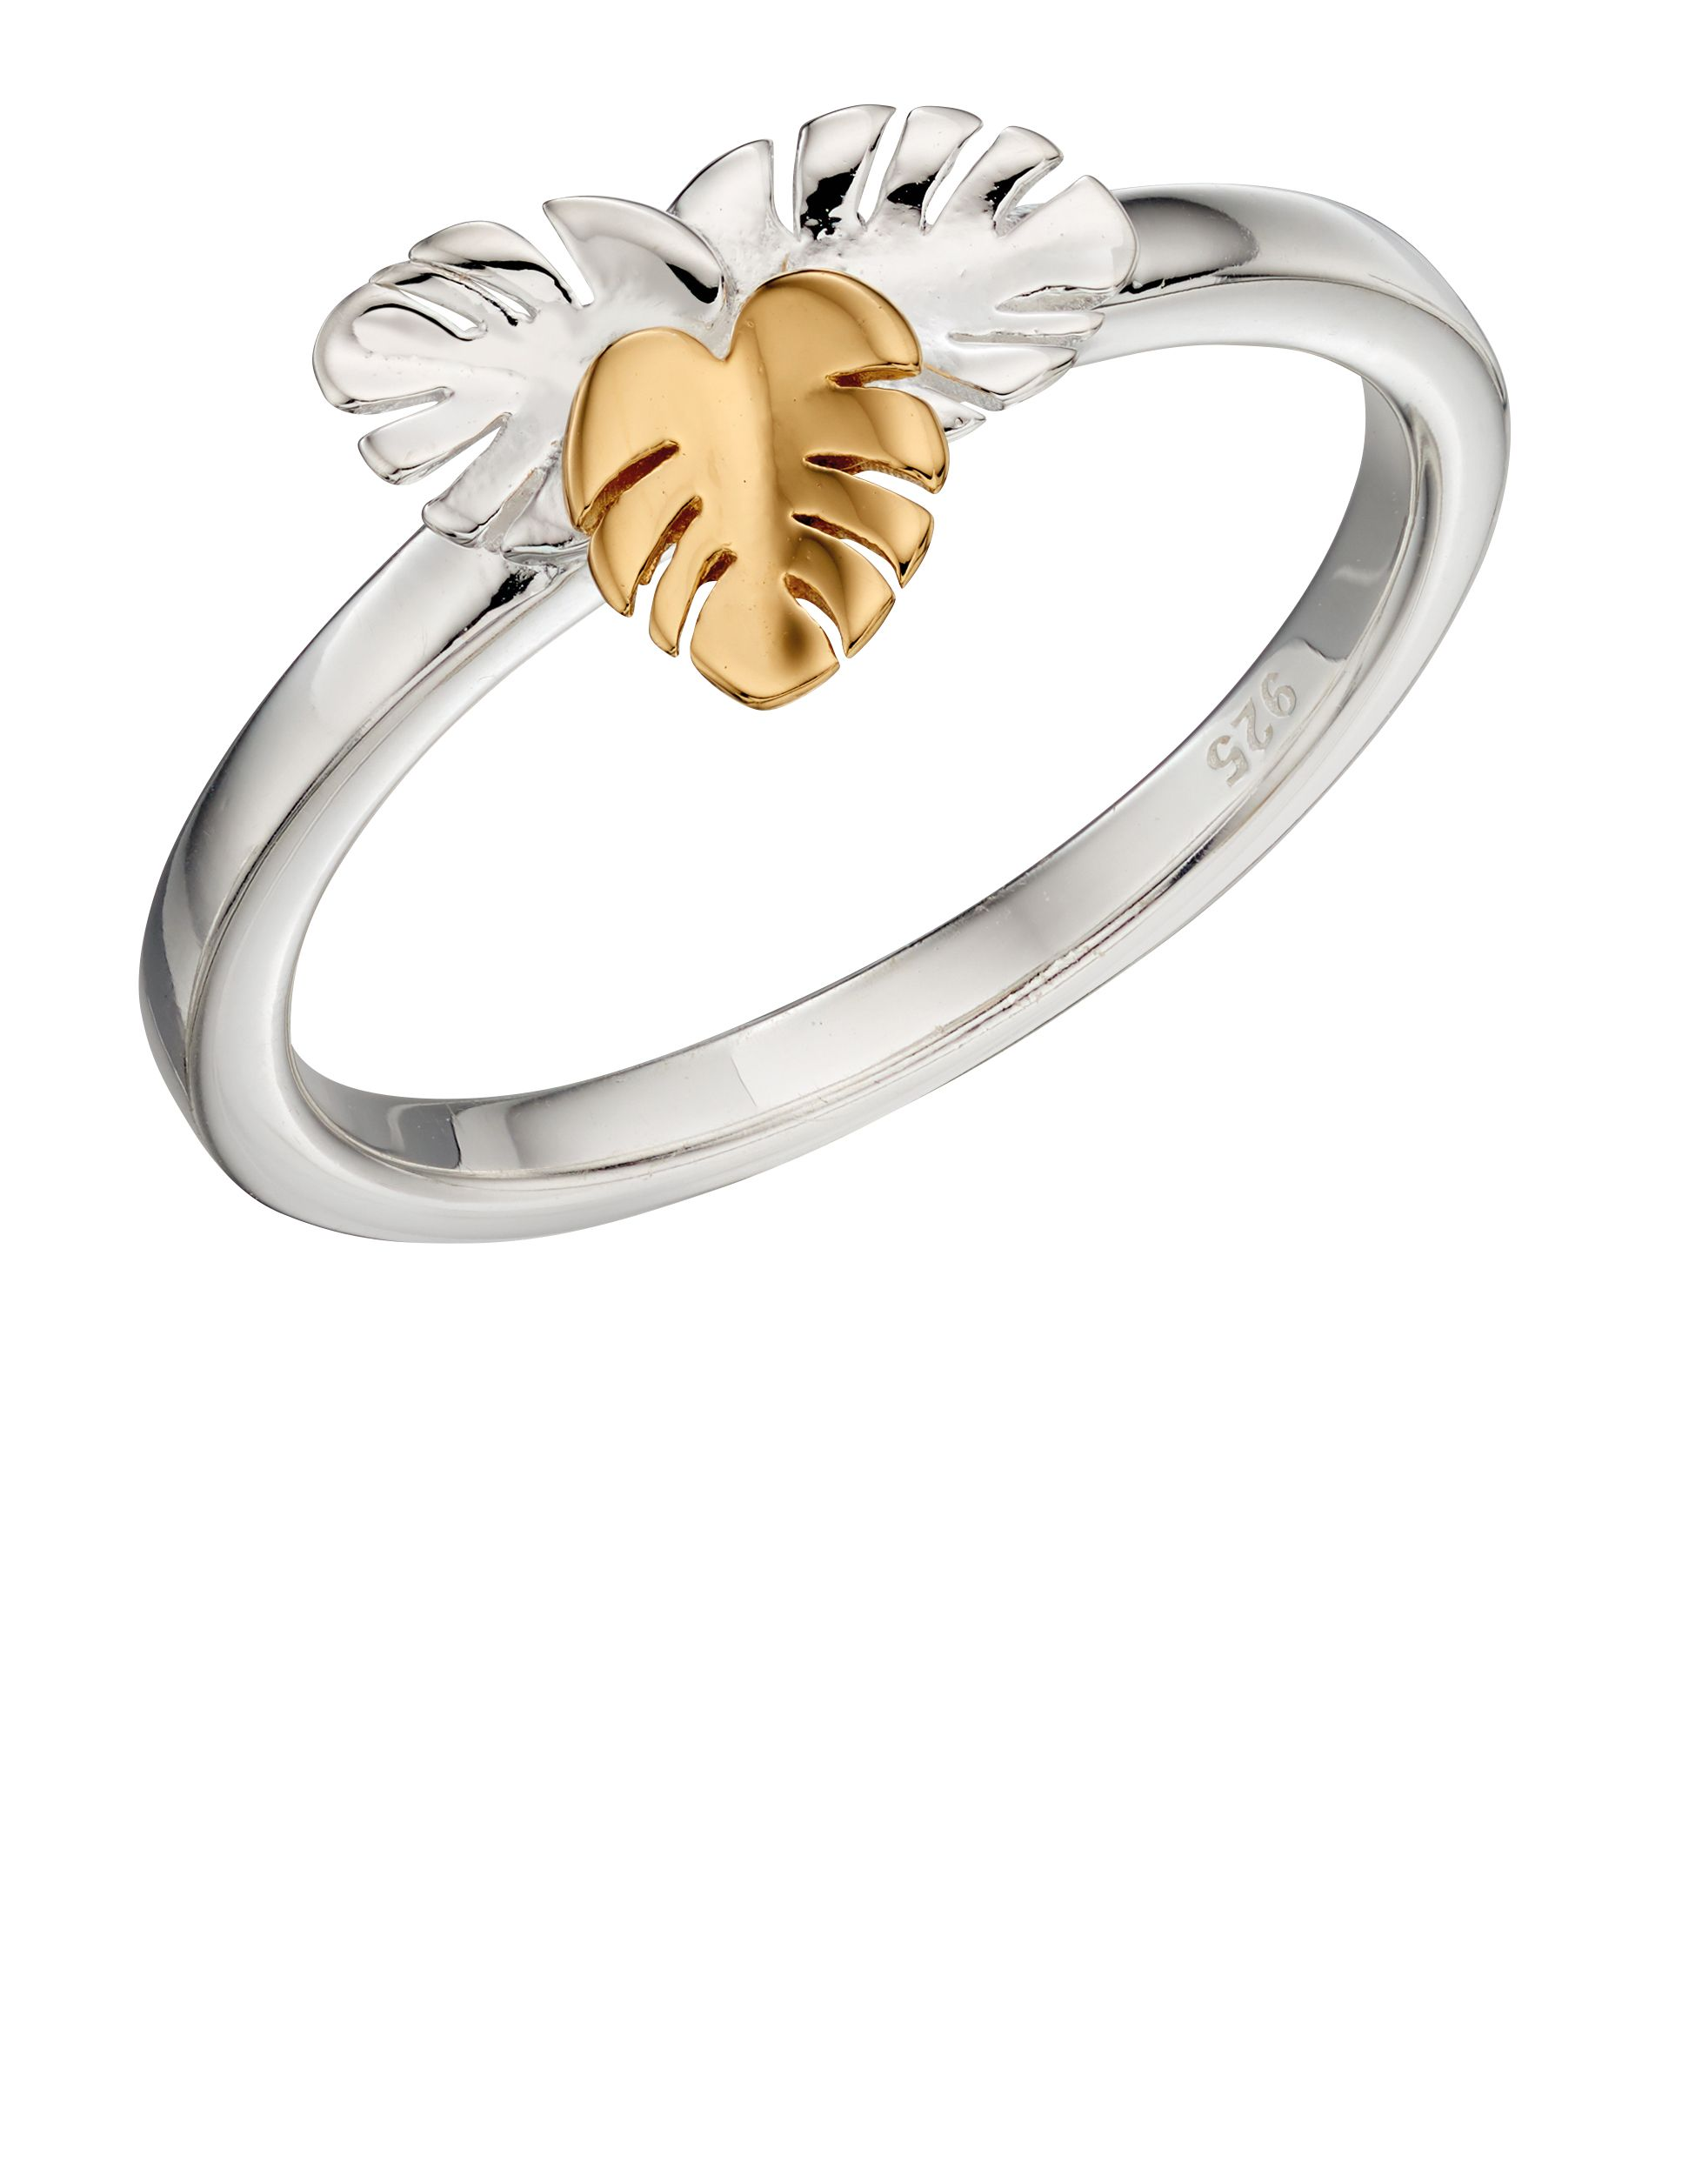 Elements Silver - Women Cubic Zirconia Ring